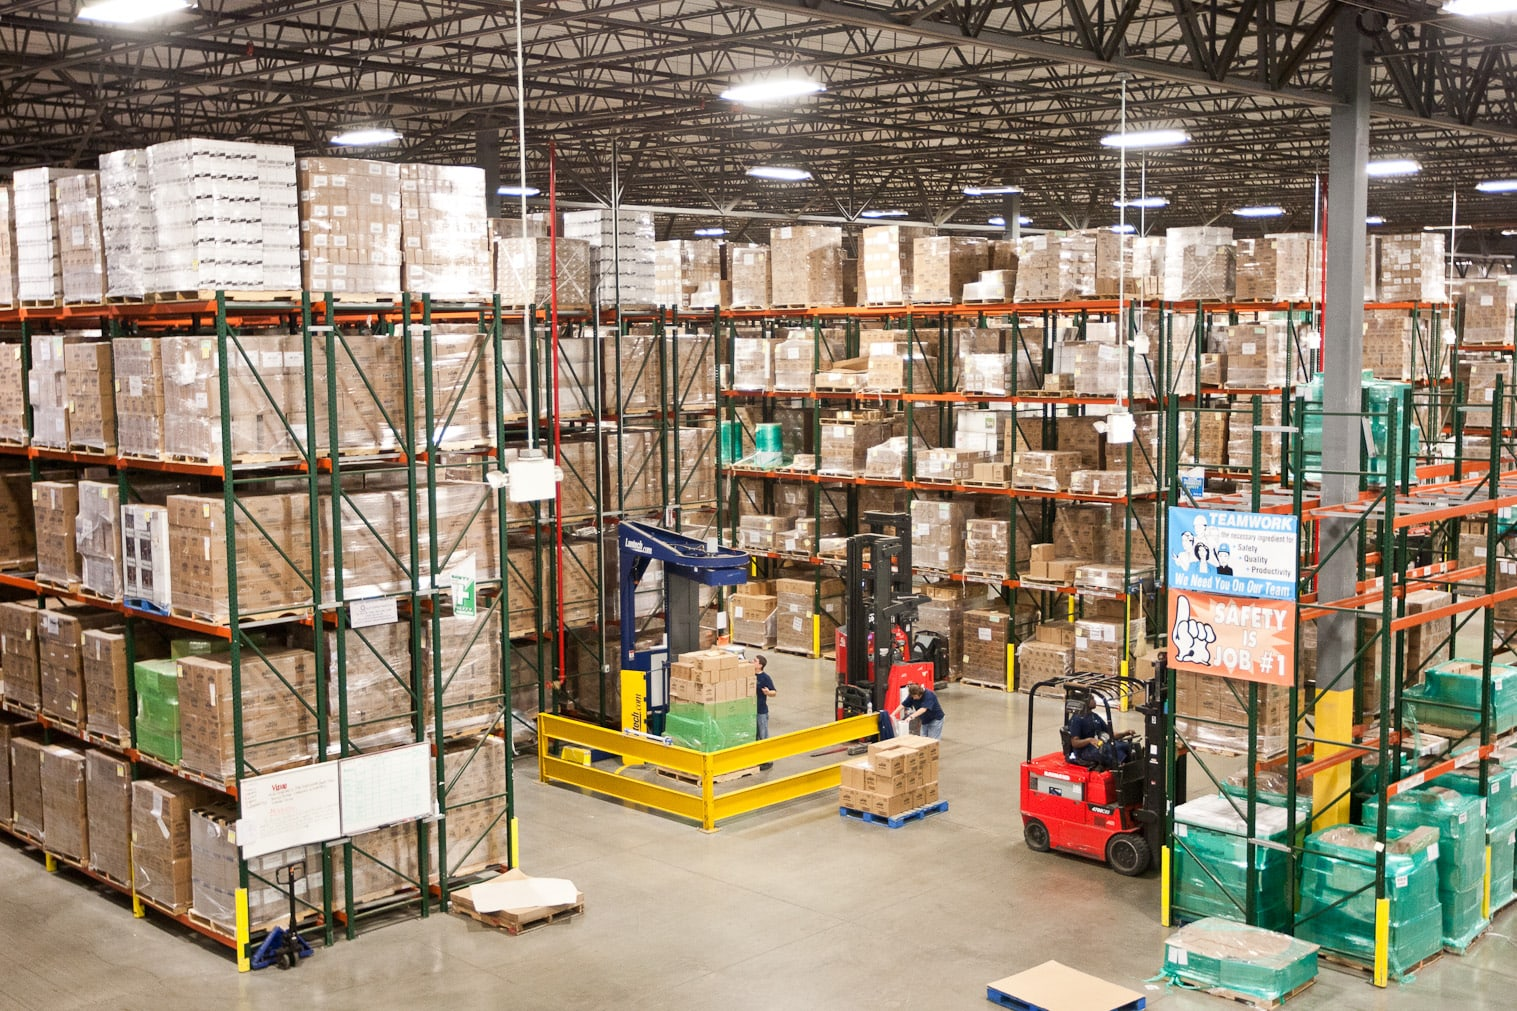 LeSaint Expands Client Warehousing Operations Across Southern US